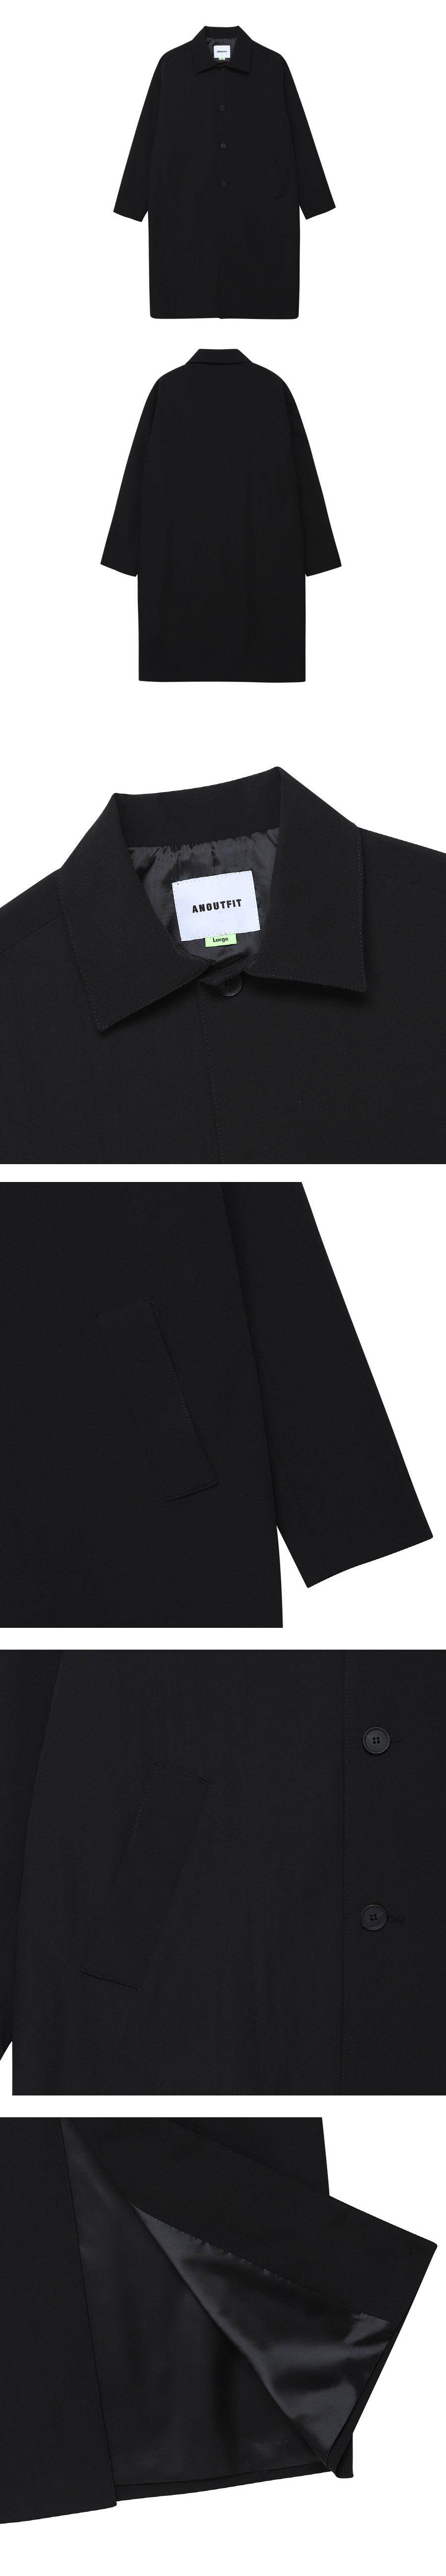 04_BLACK_DETAIL.jpg